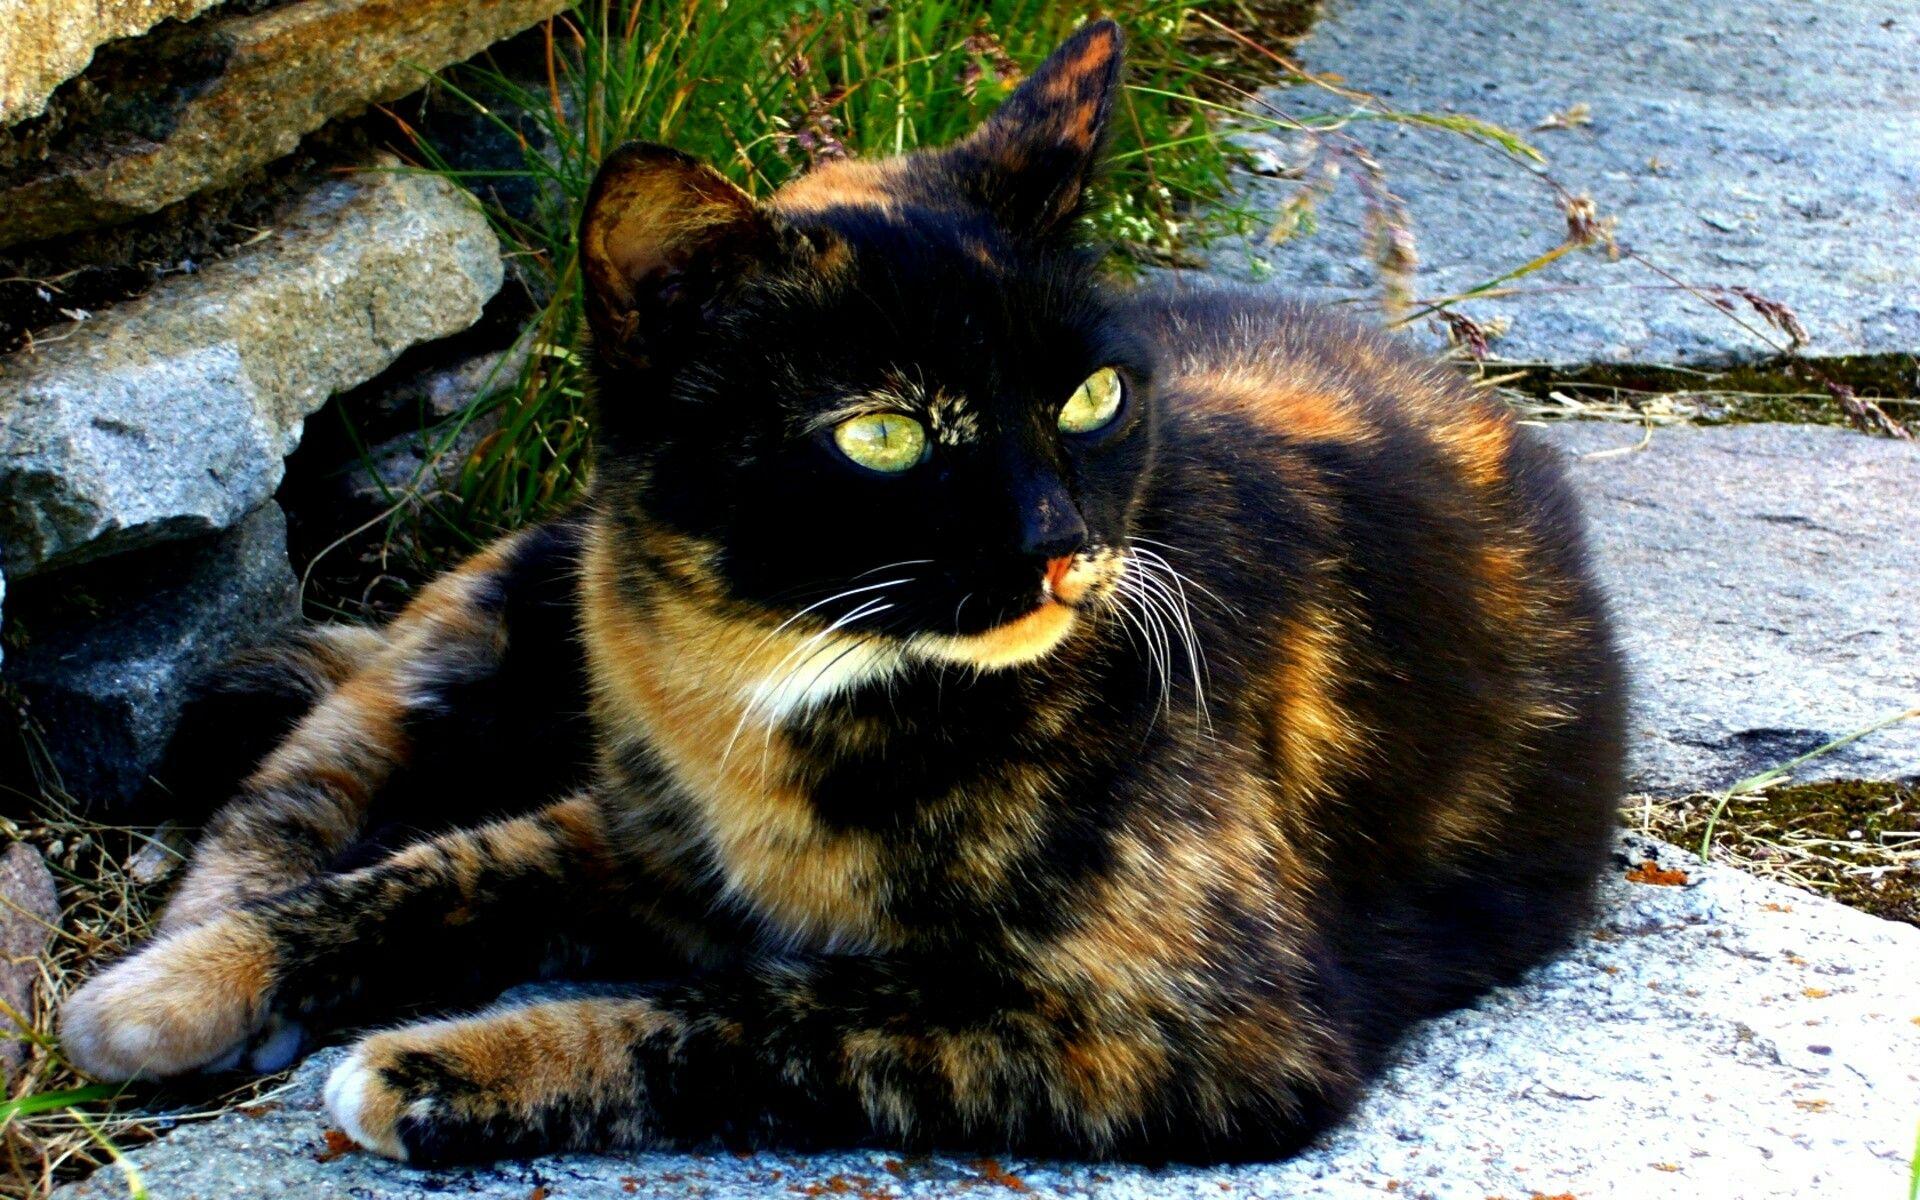 Pin By Desislava Rahneva On My Warrior Cats Gorgeous Cats Beautiful Kittens Beautiful Cats